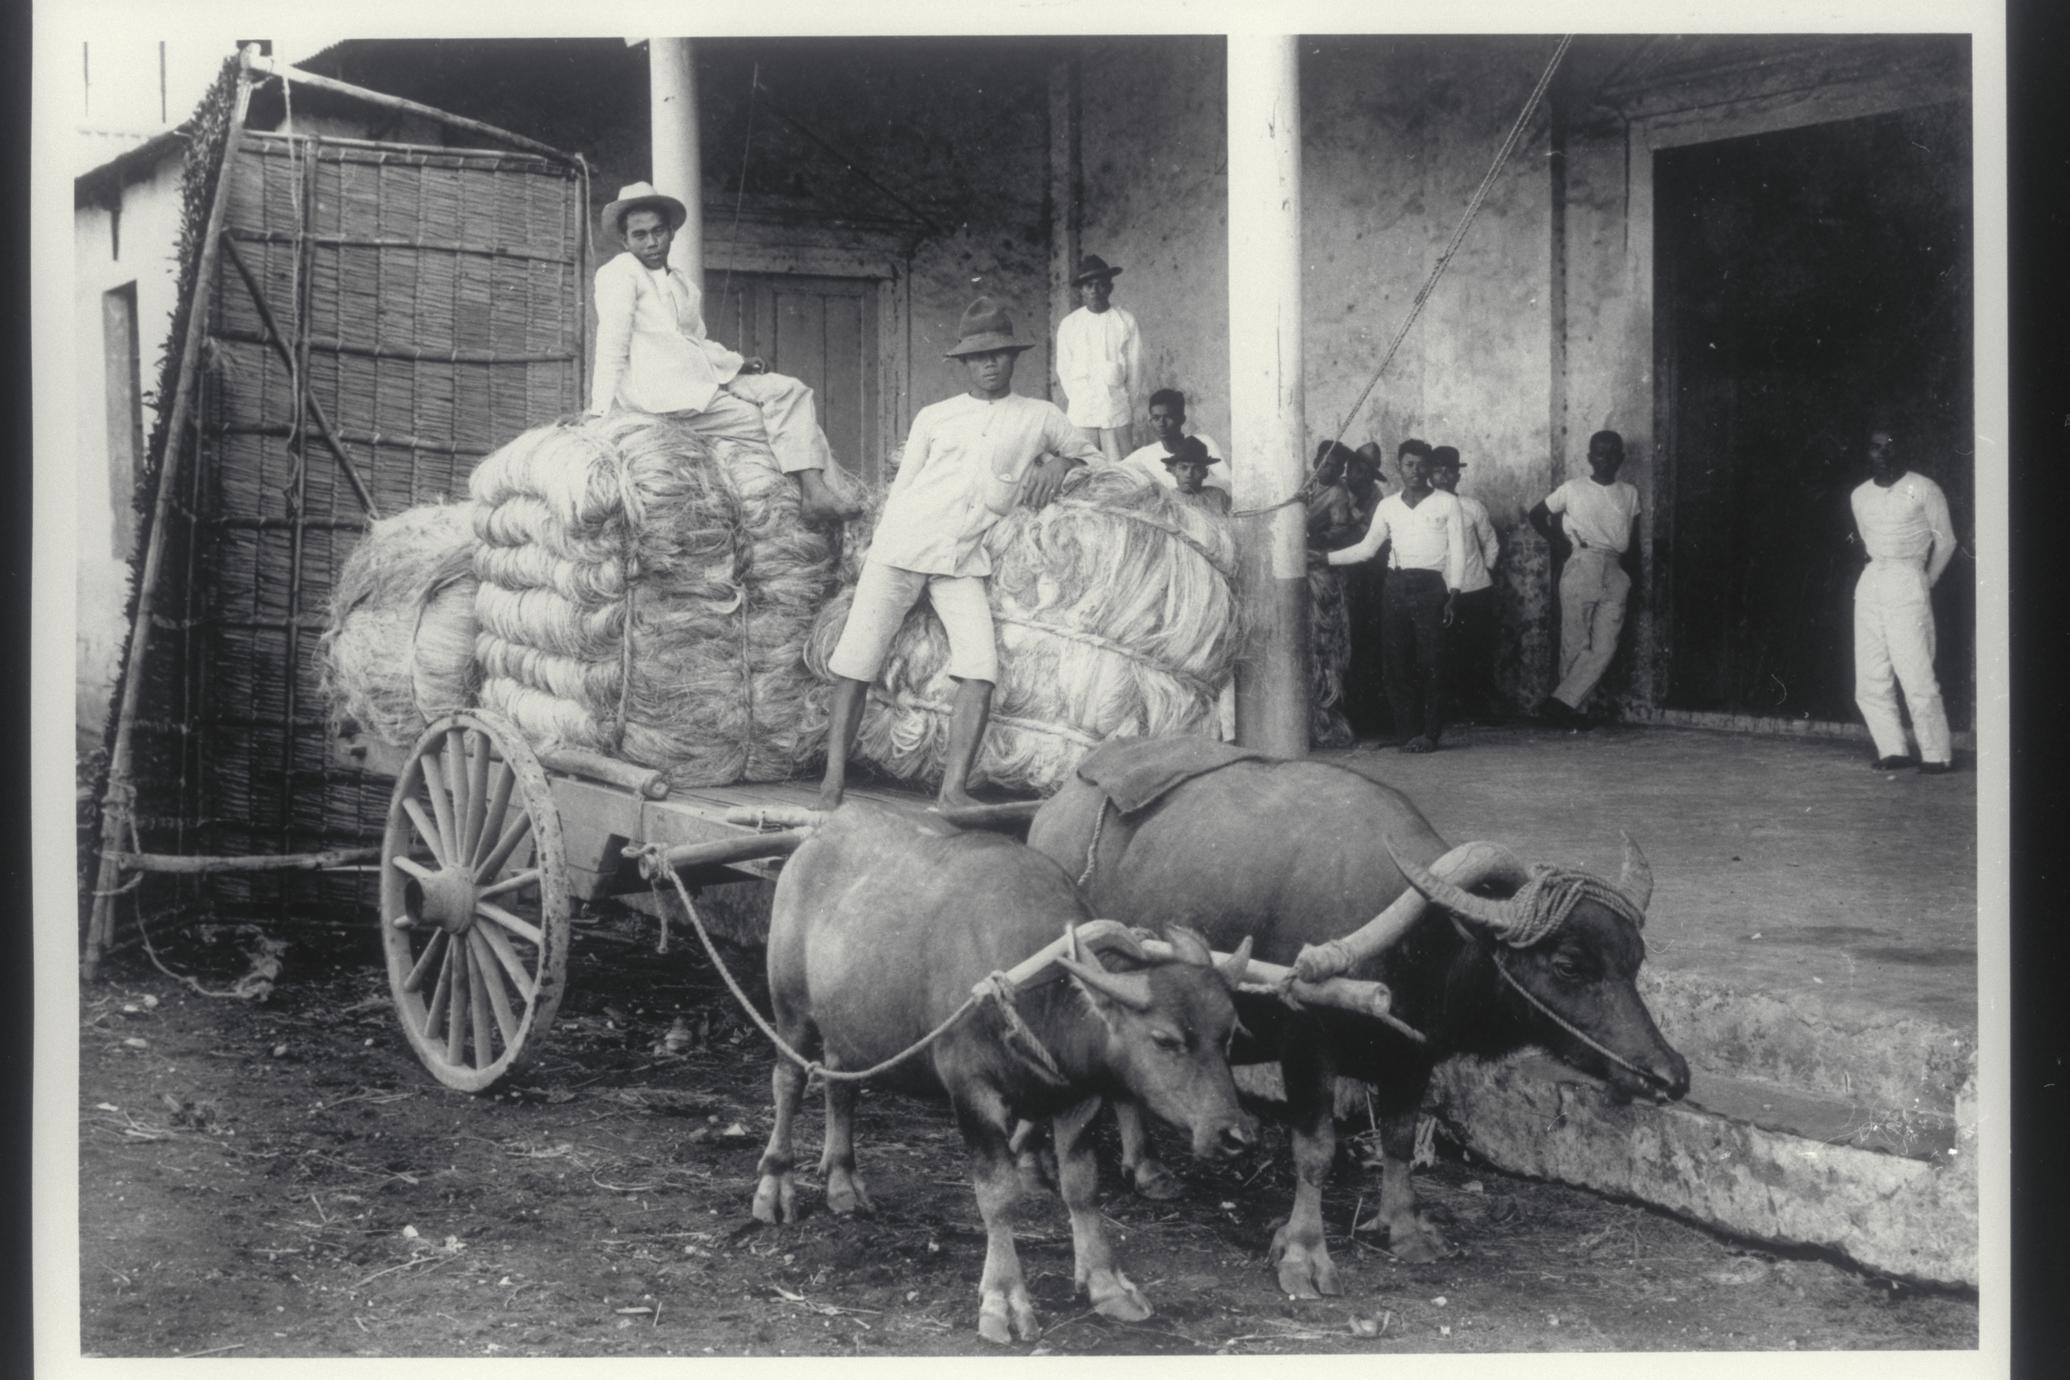 Hemp being unloaded at a storehouse, Legaspi, Albay, 1910-1912